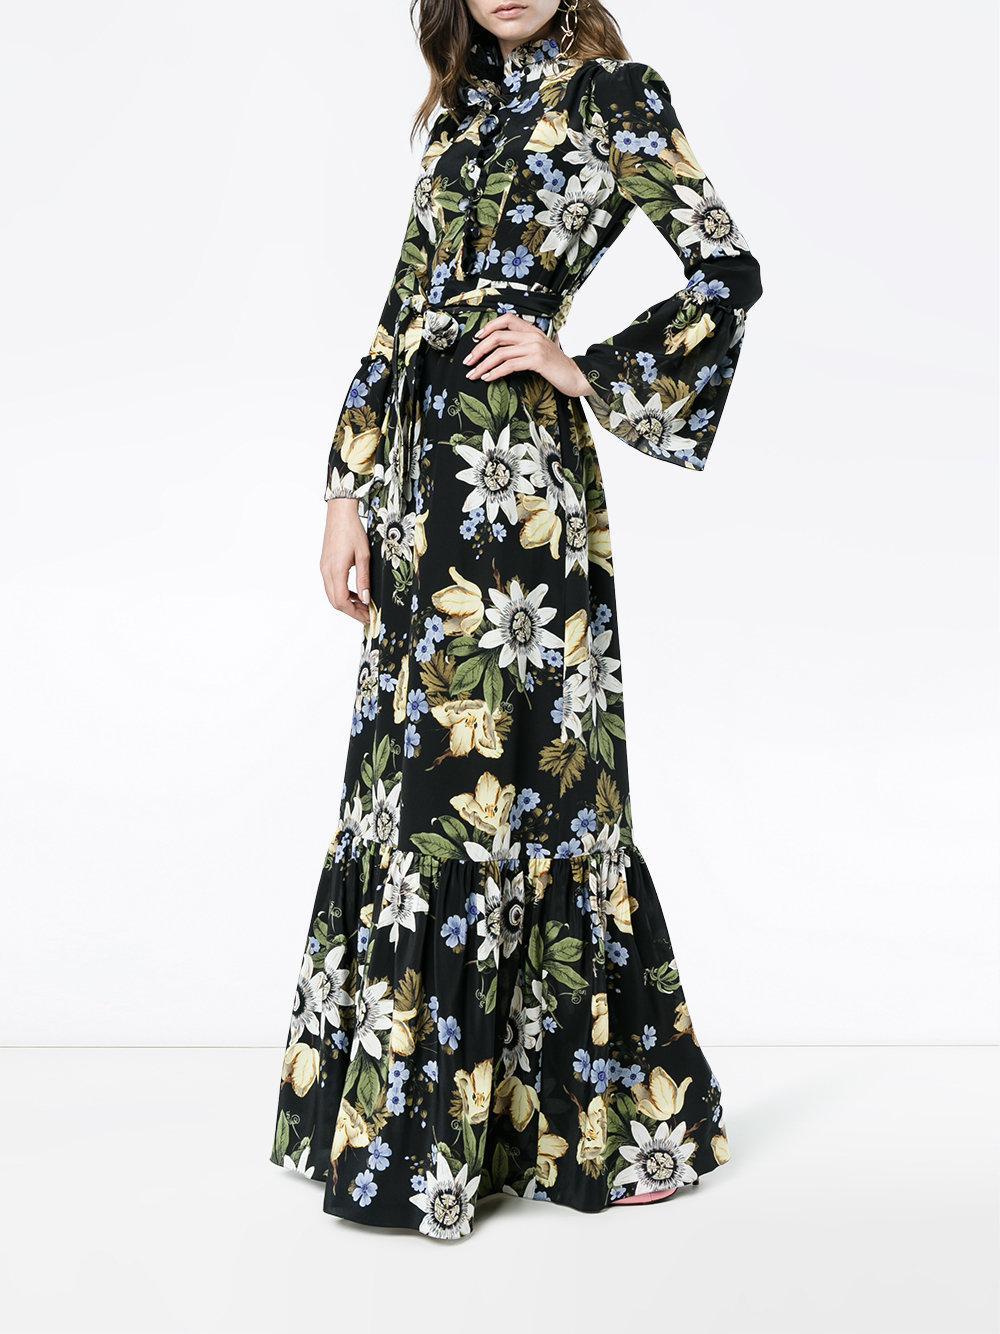 a7e8909020f0 Lyst - Erdem Stephanie Floral Print Ruffle Dress in Black - Save 58%